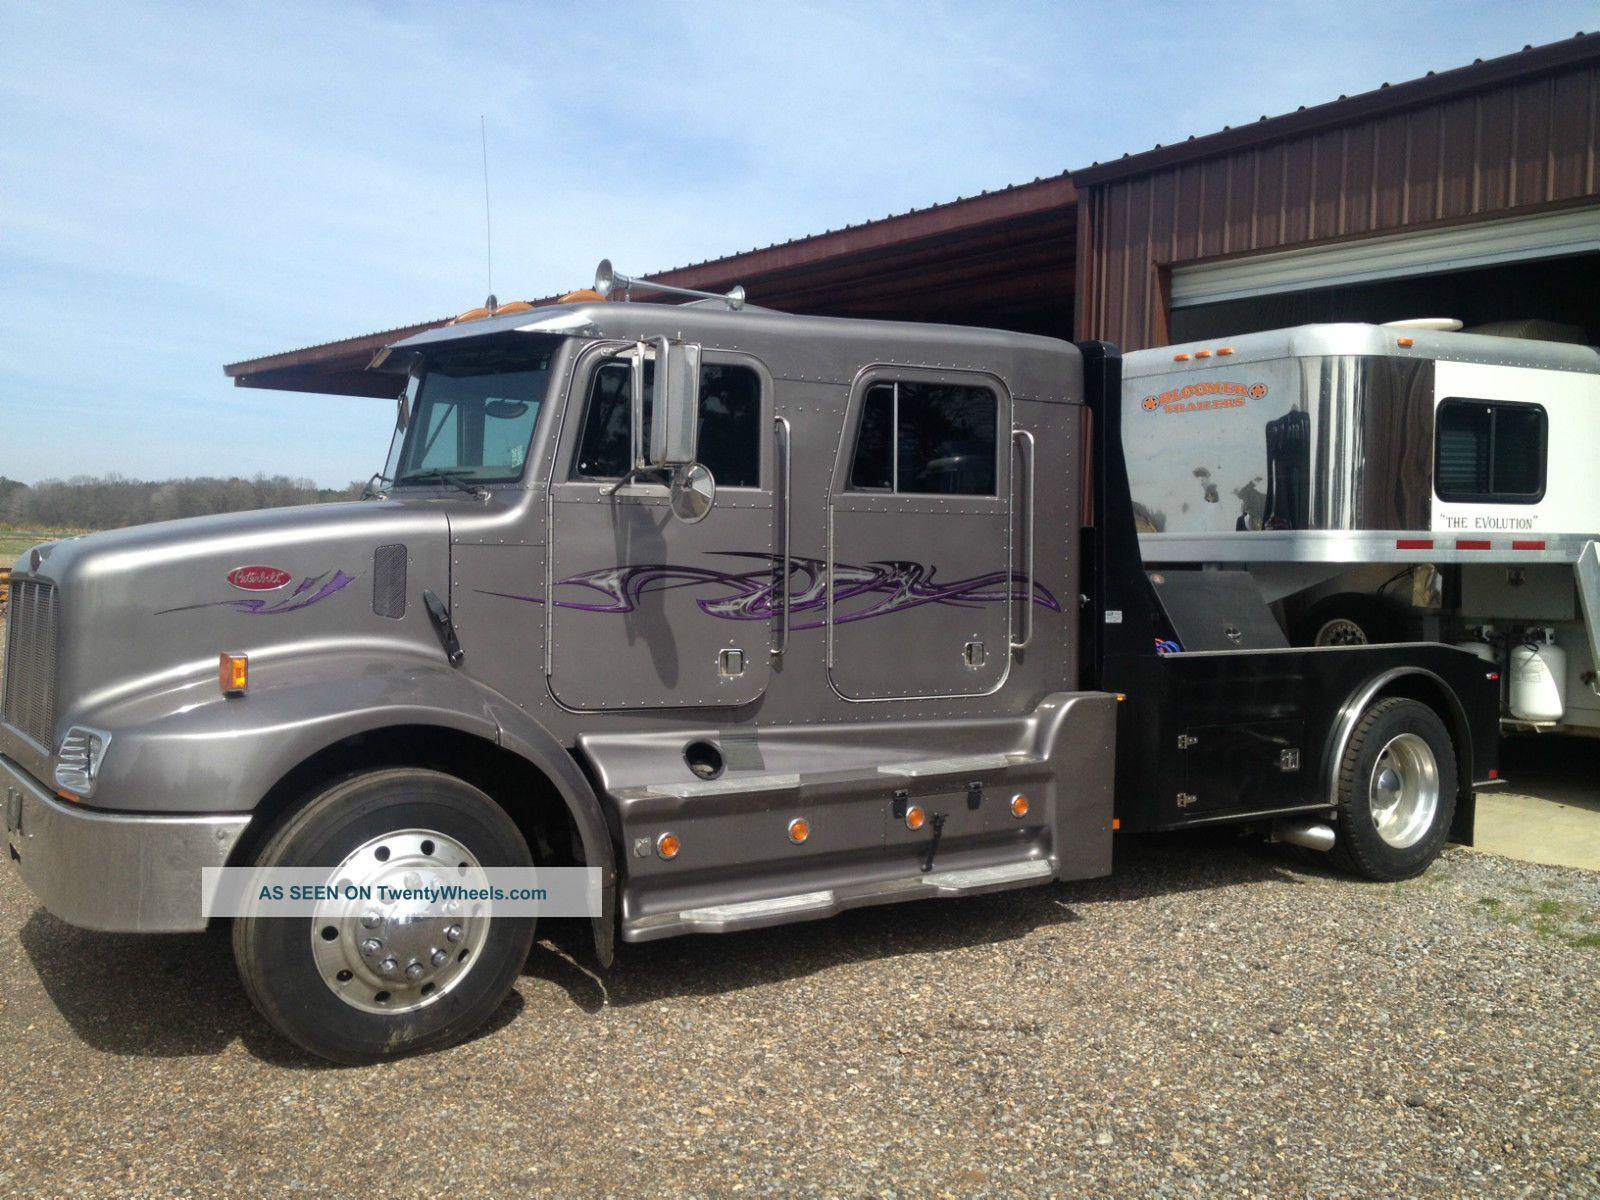 2014 Suspension Lifts 2000 Peterbilt 330 Other Medium Duty Trucks photo